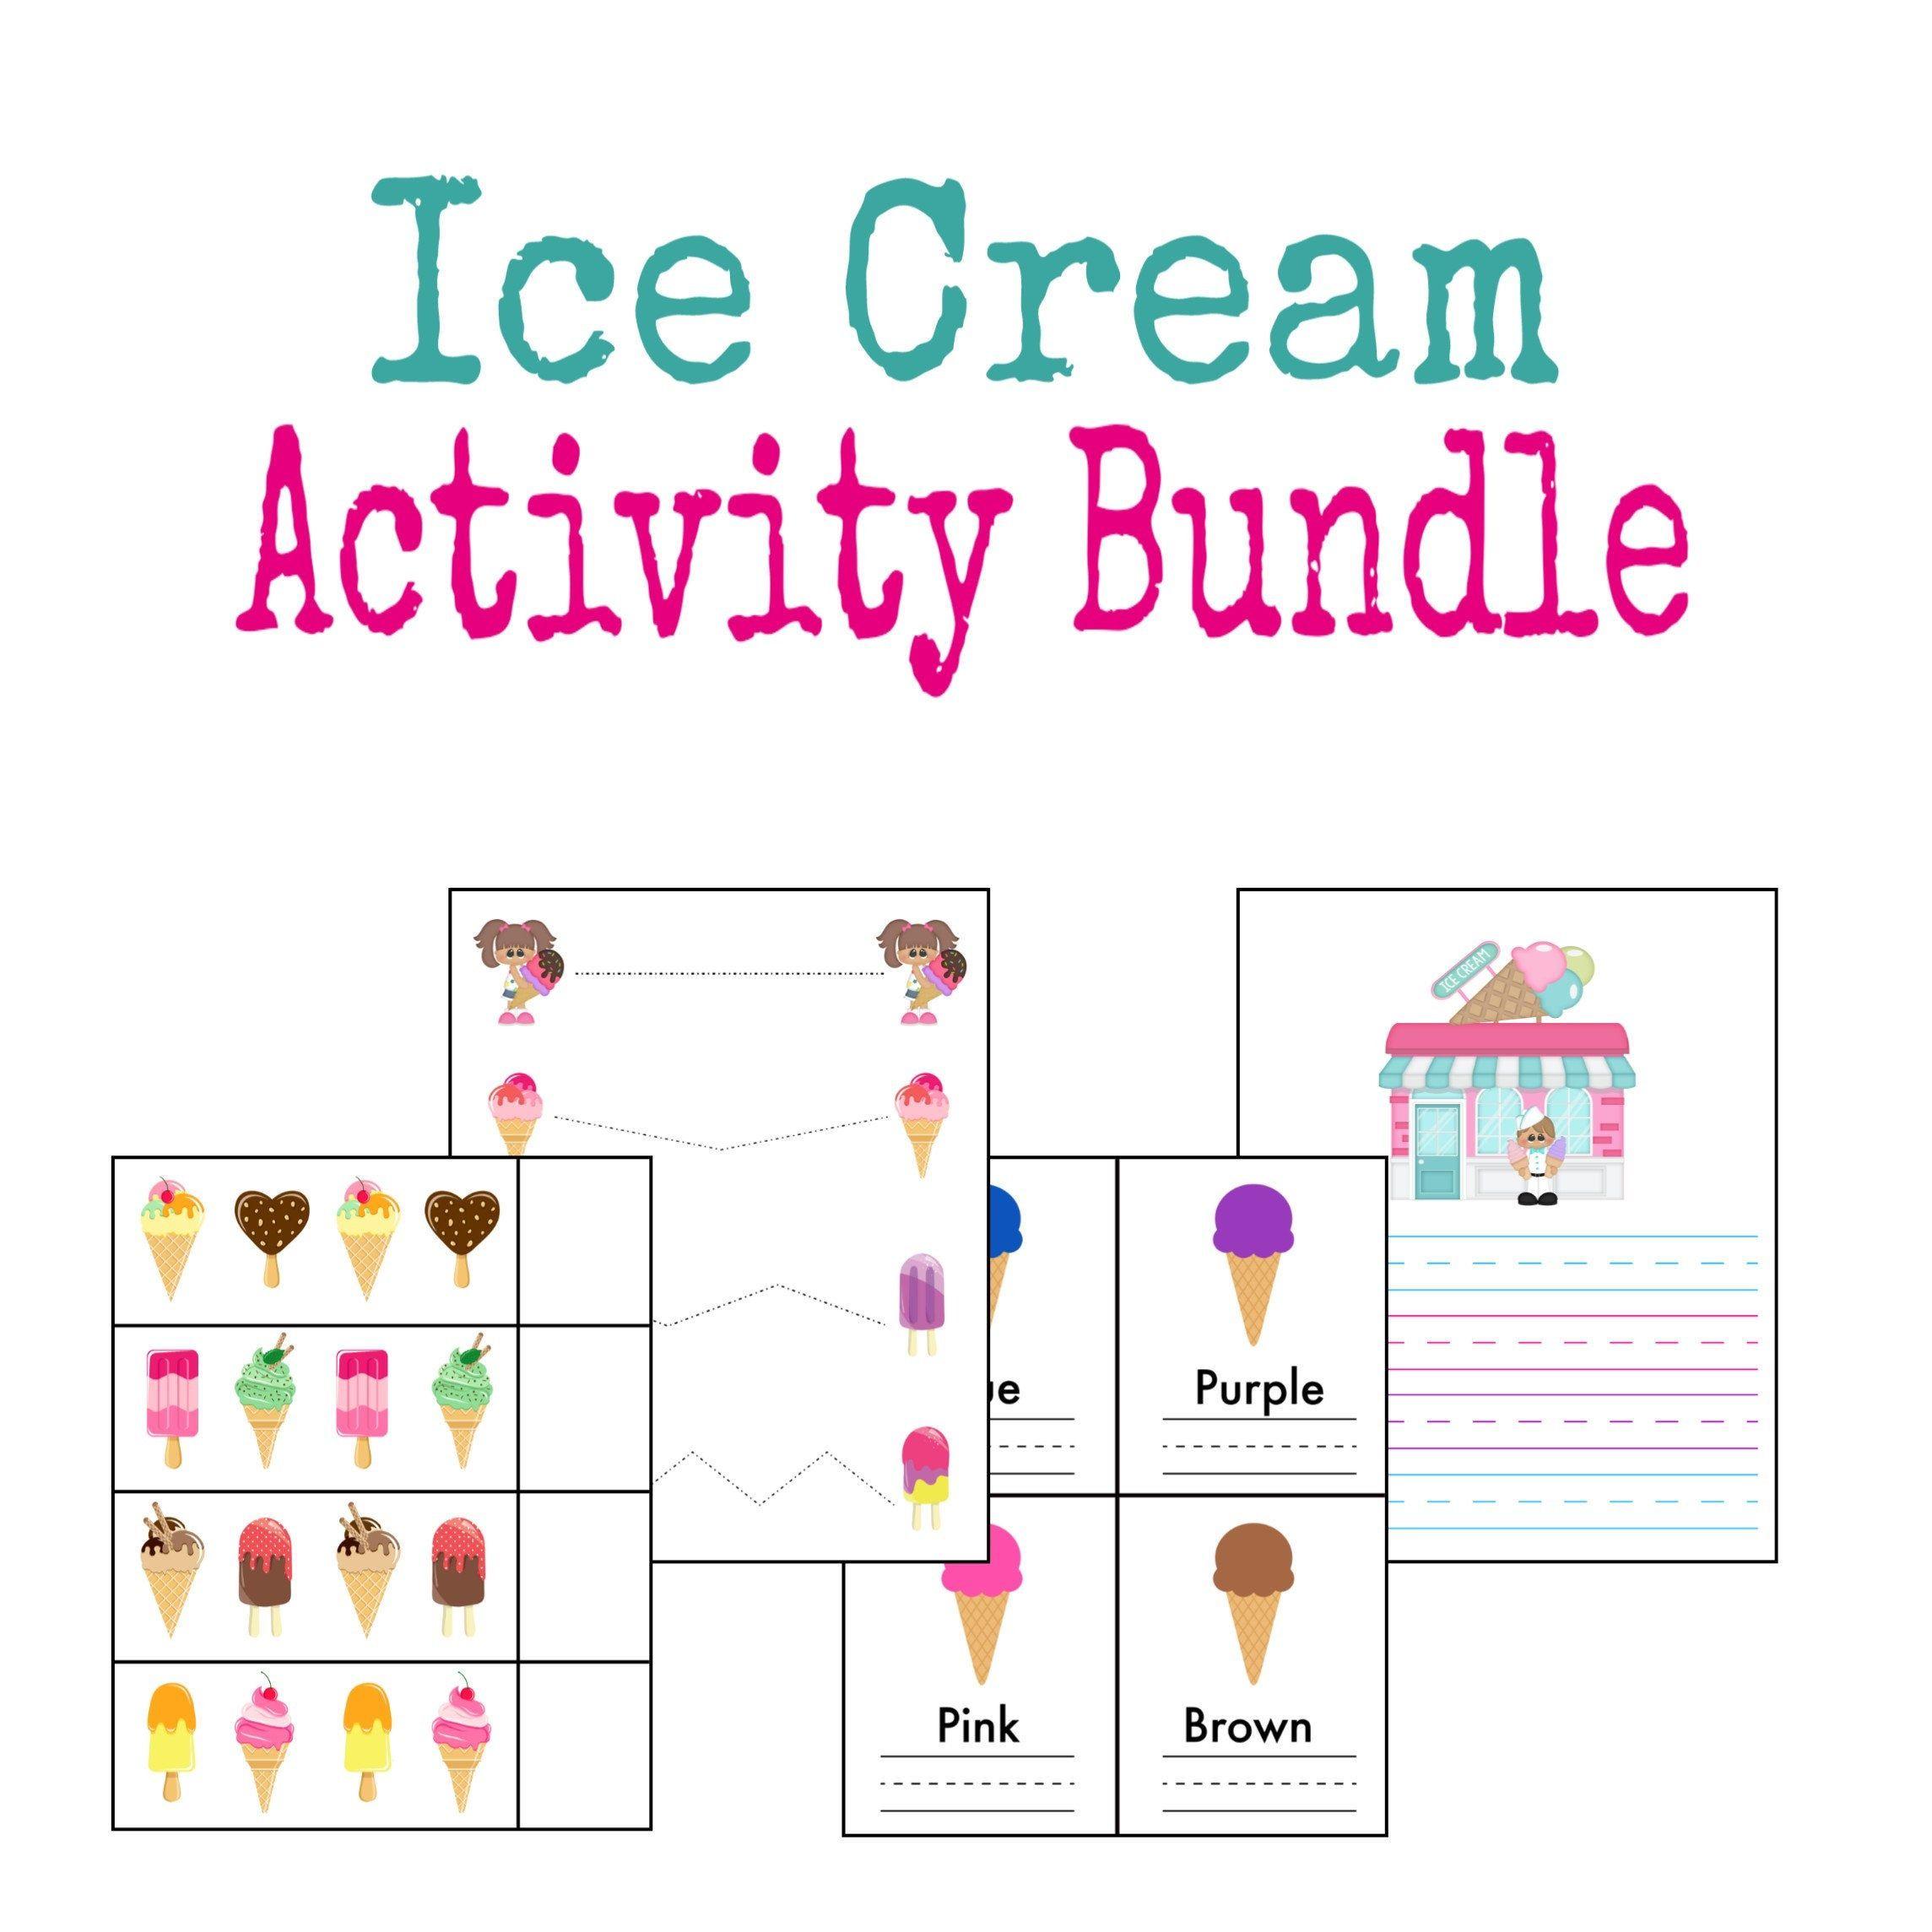 Ice Cream Patterns Activity File Folder Game Busy Binder